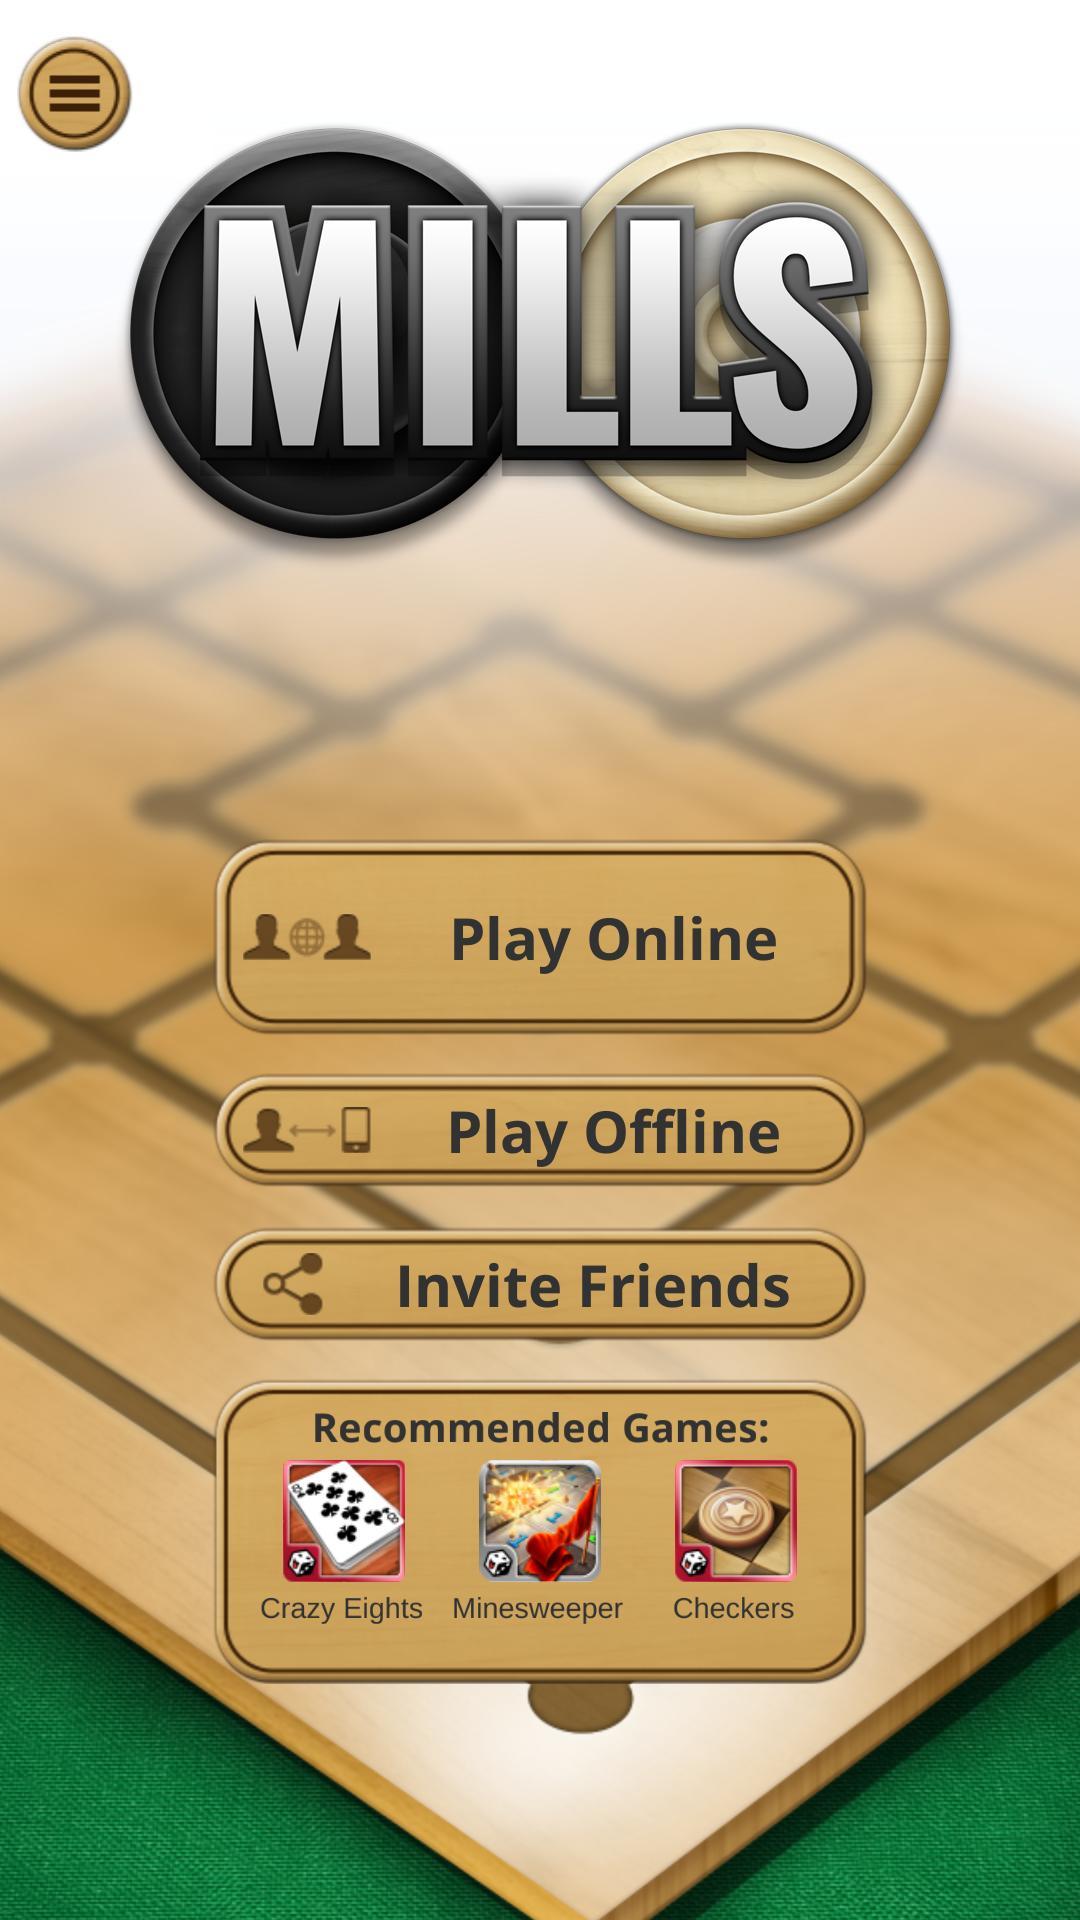 Nine men's Morris - Mills - Free online board game 2.8.11 Screenshot 6